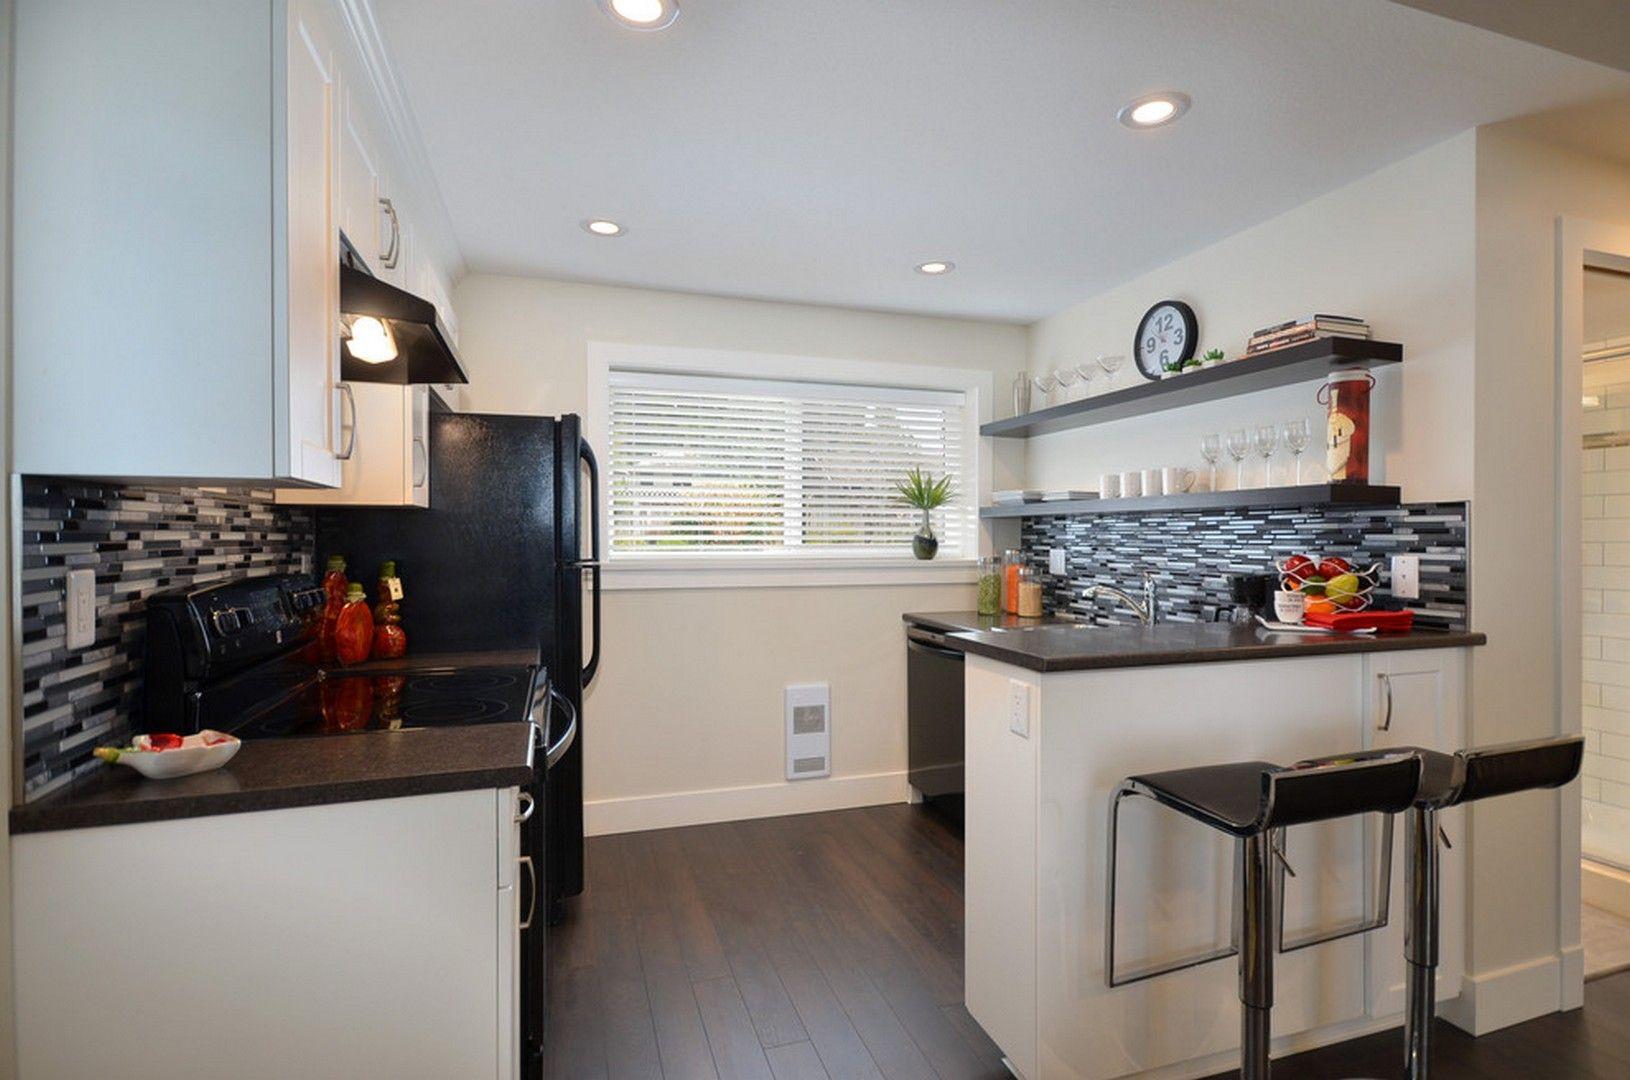 beautiful and creative tile ideas for kitchen backsplashes